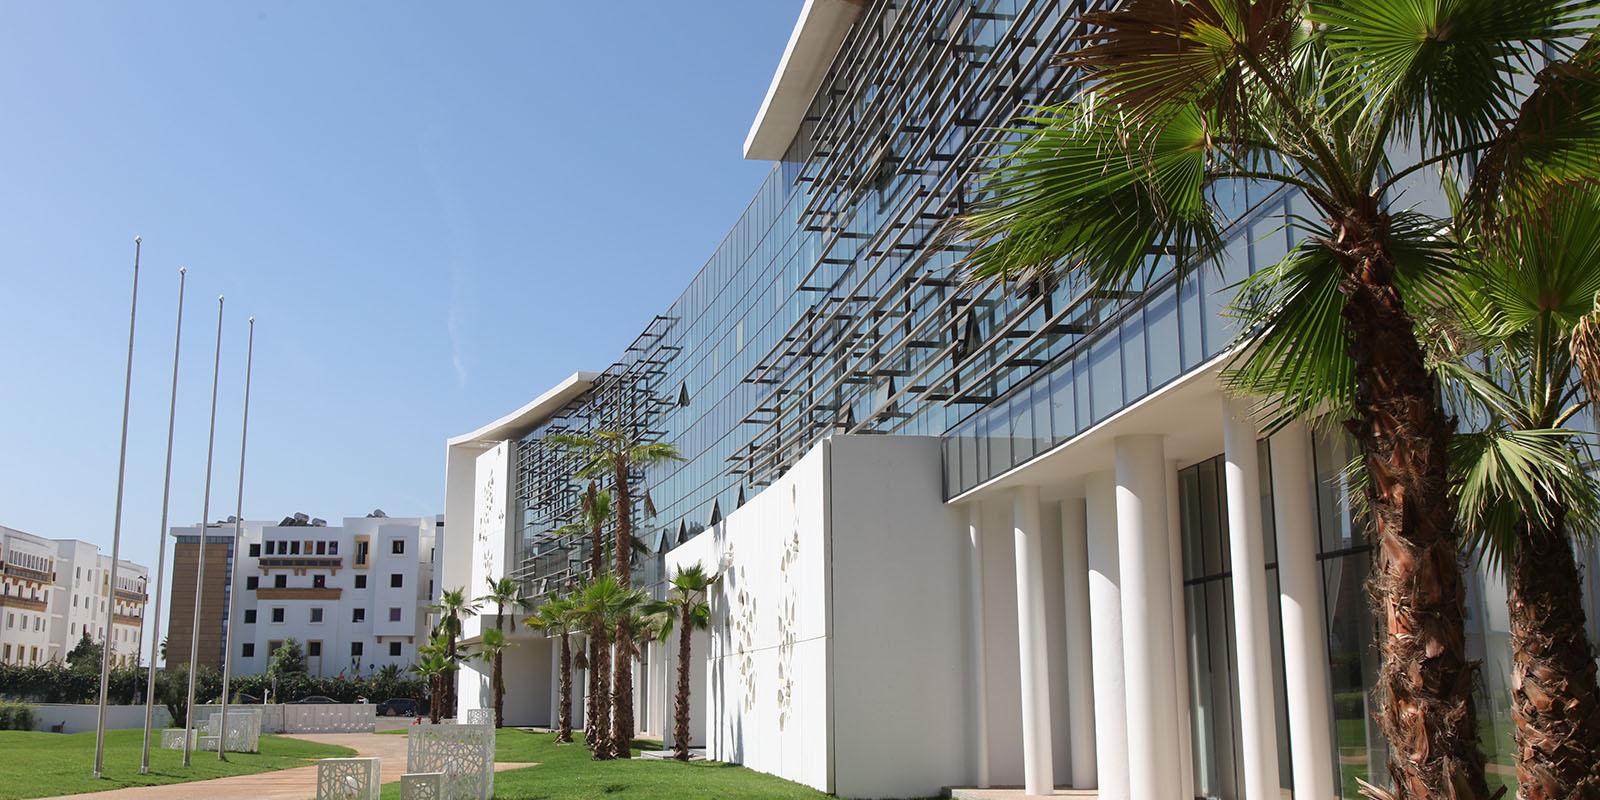 Centre de formation Lalla Khadija